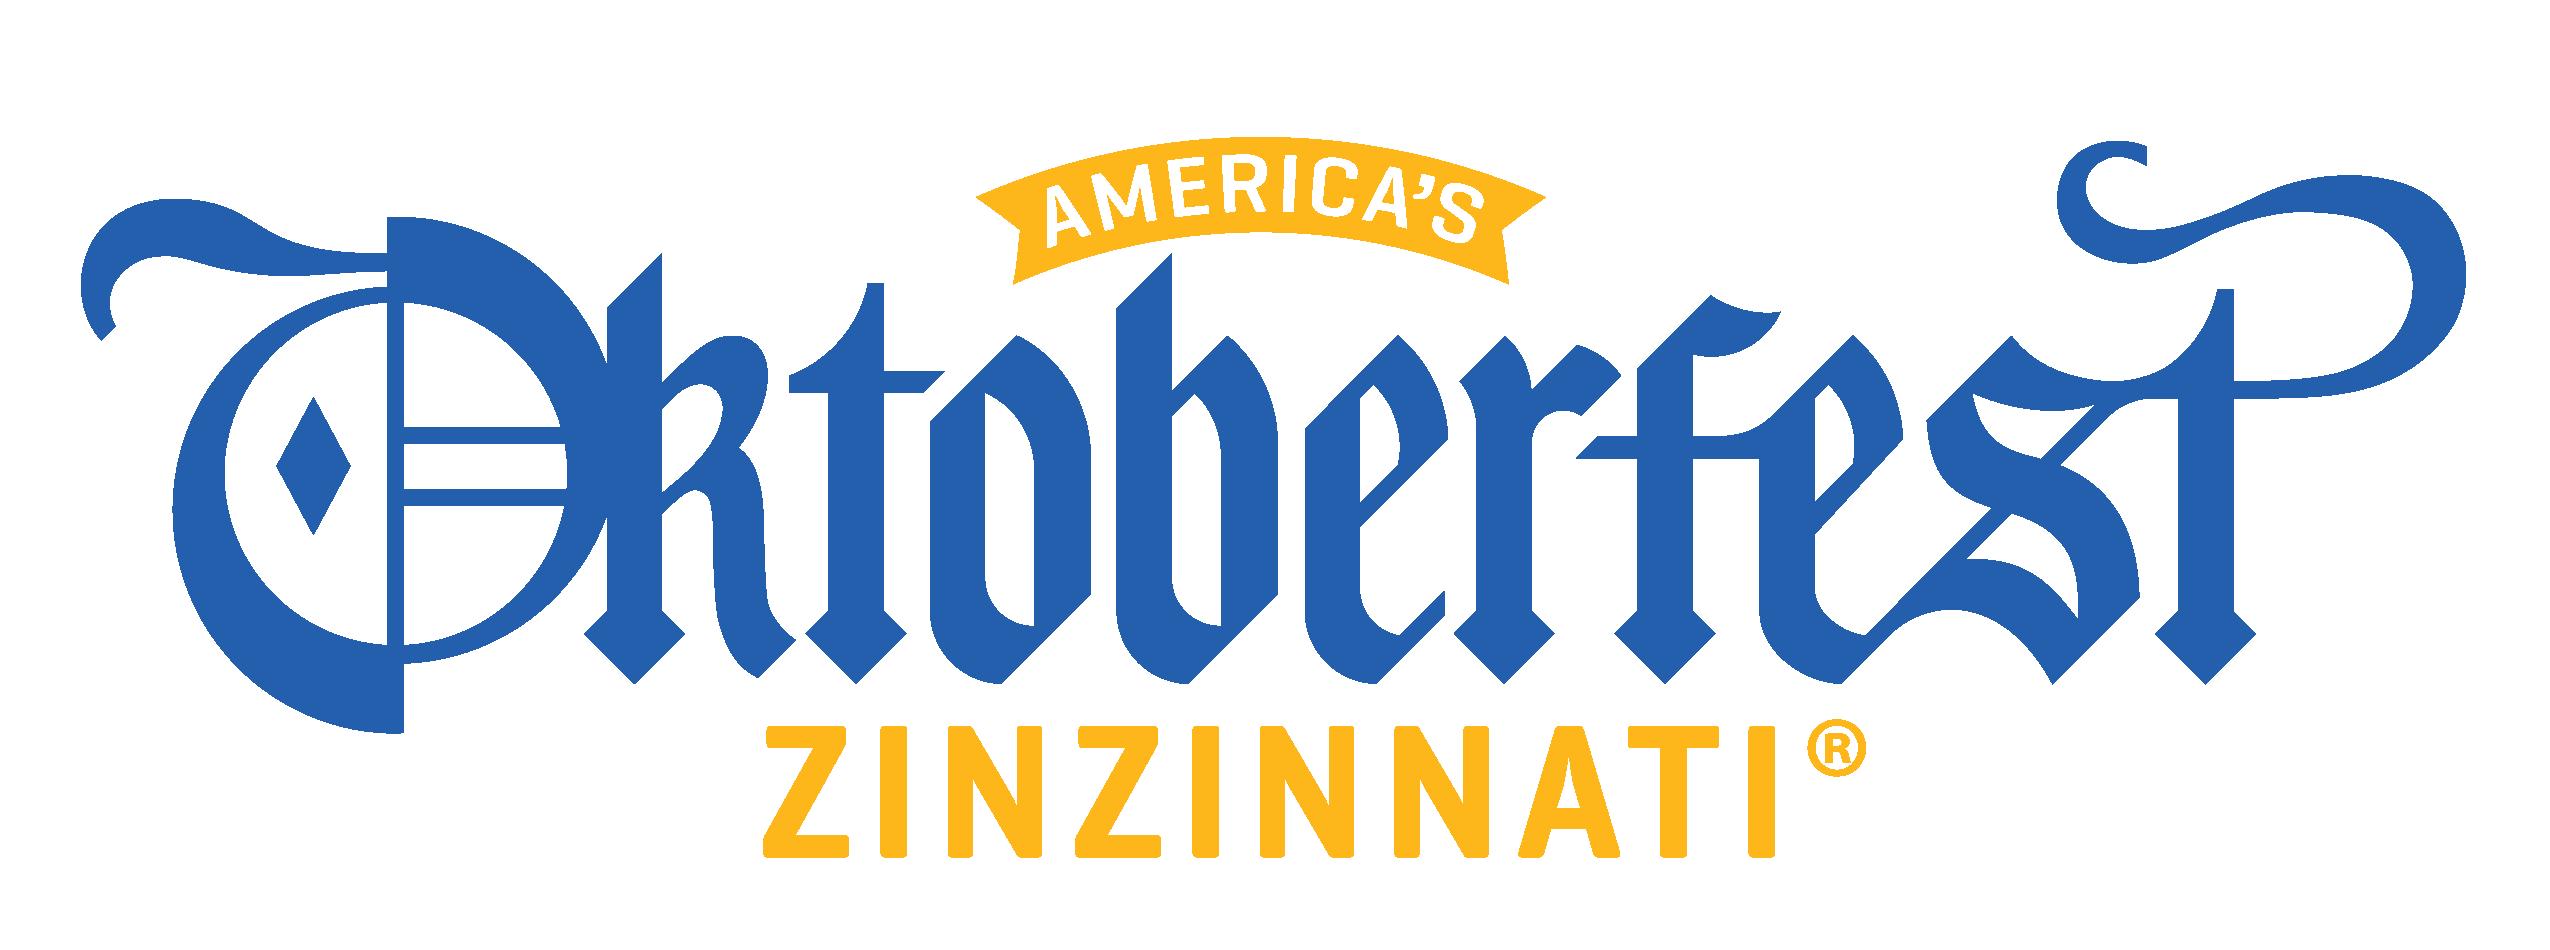 Oktoberfest Vendor Application